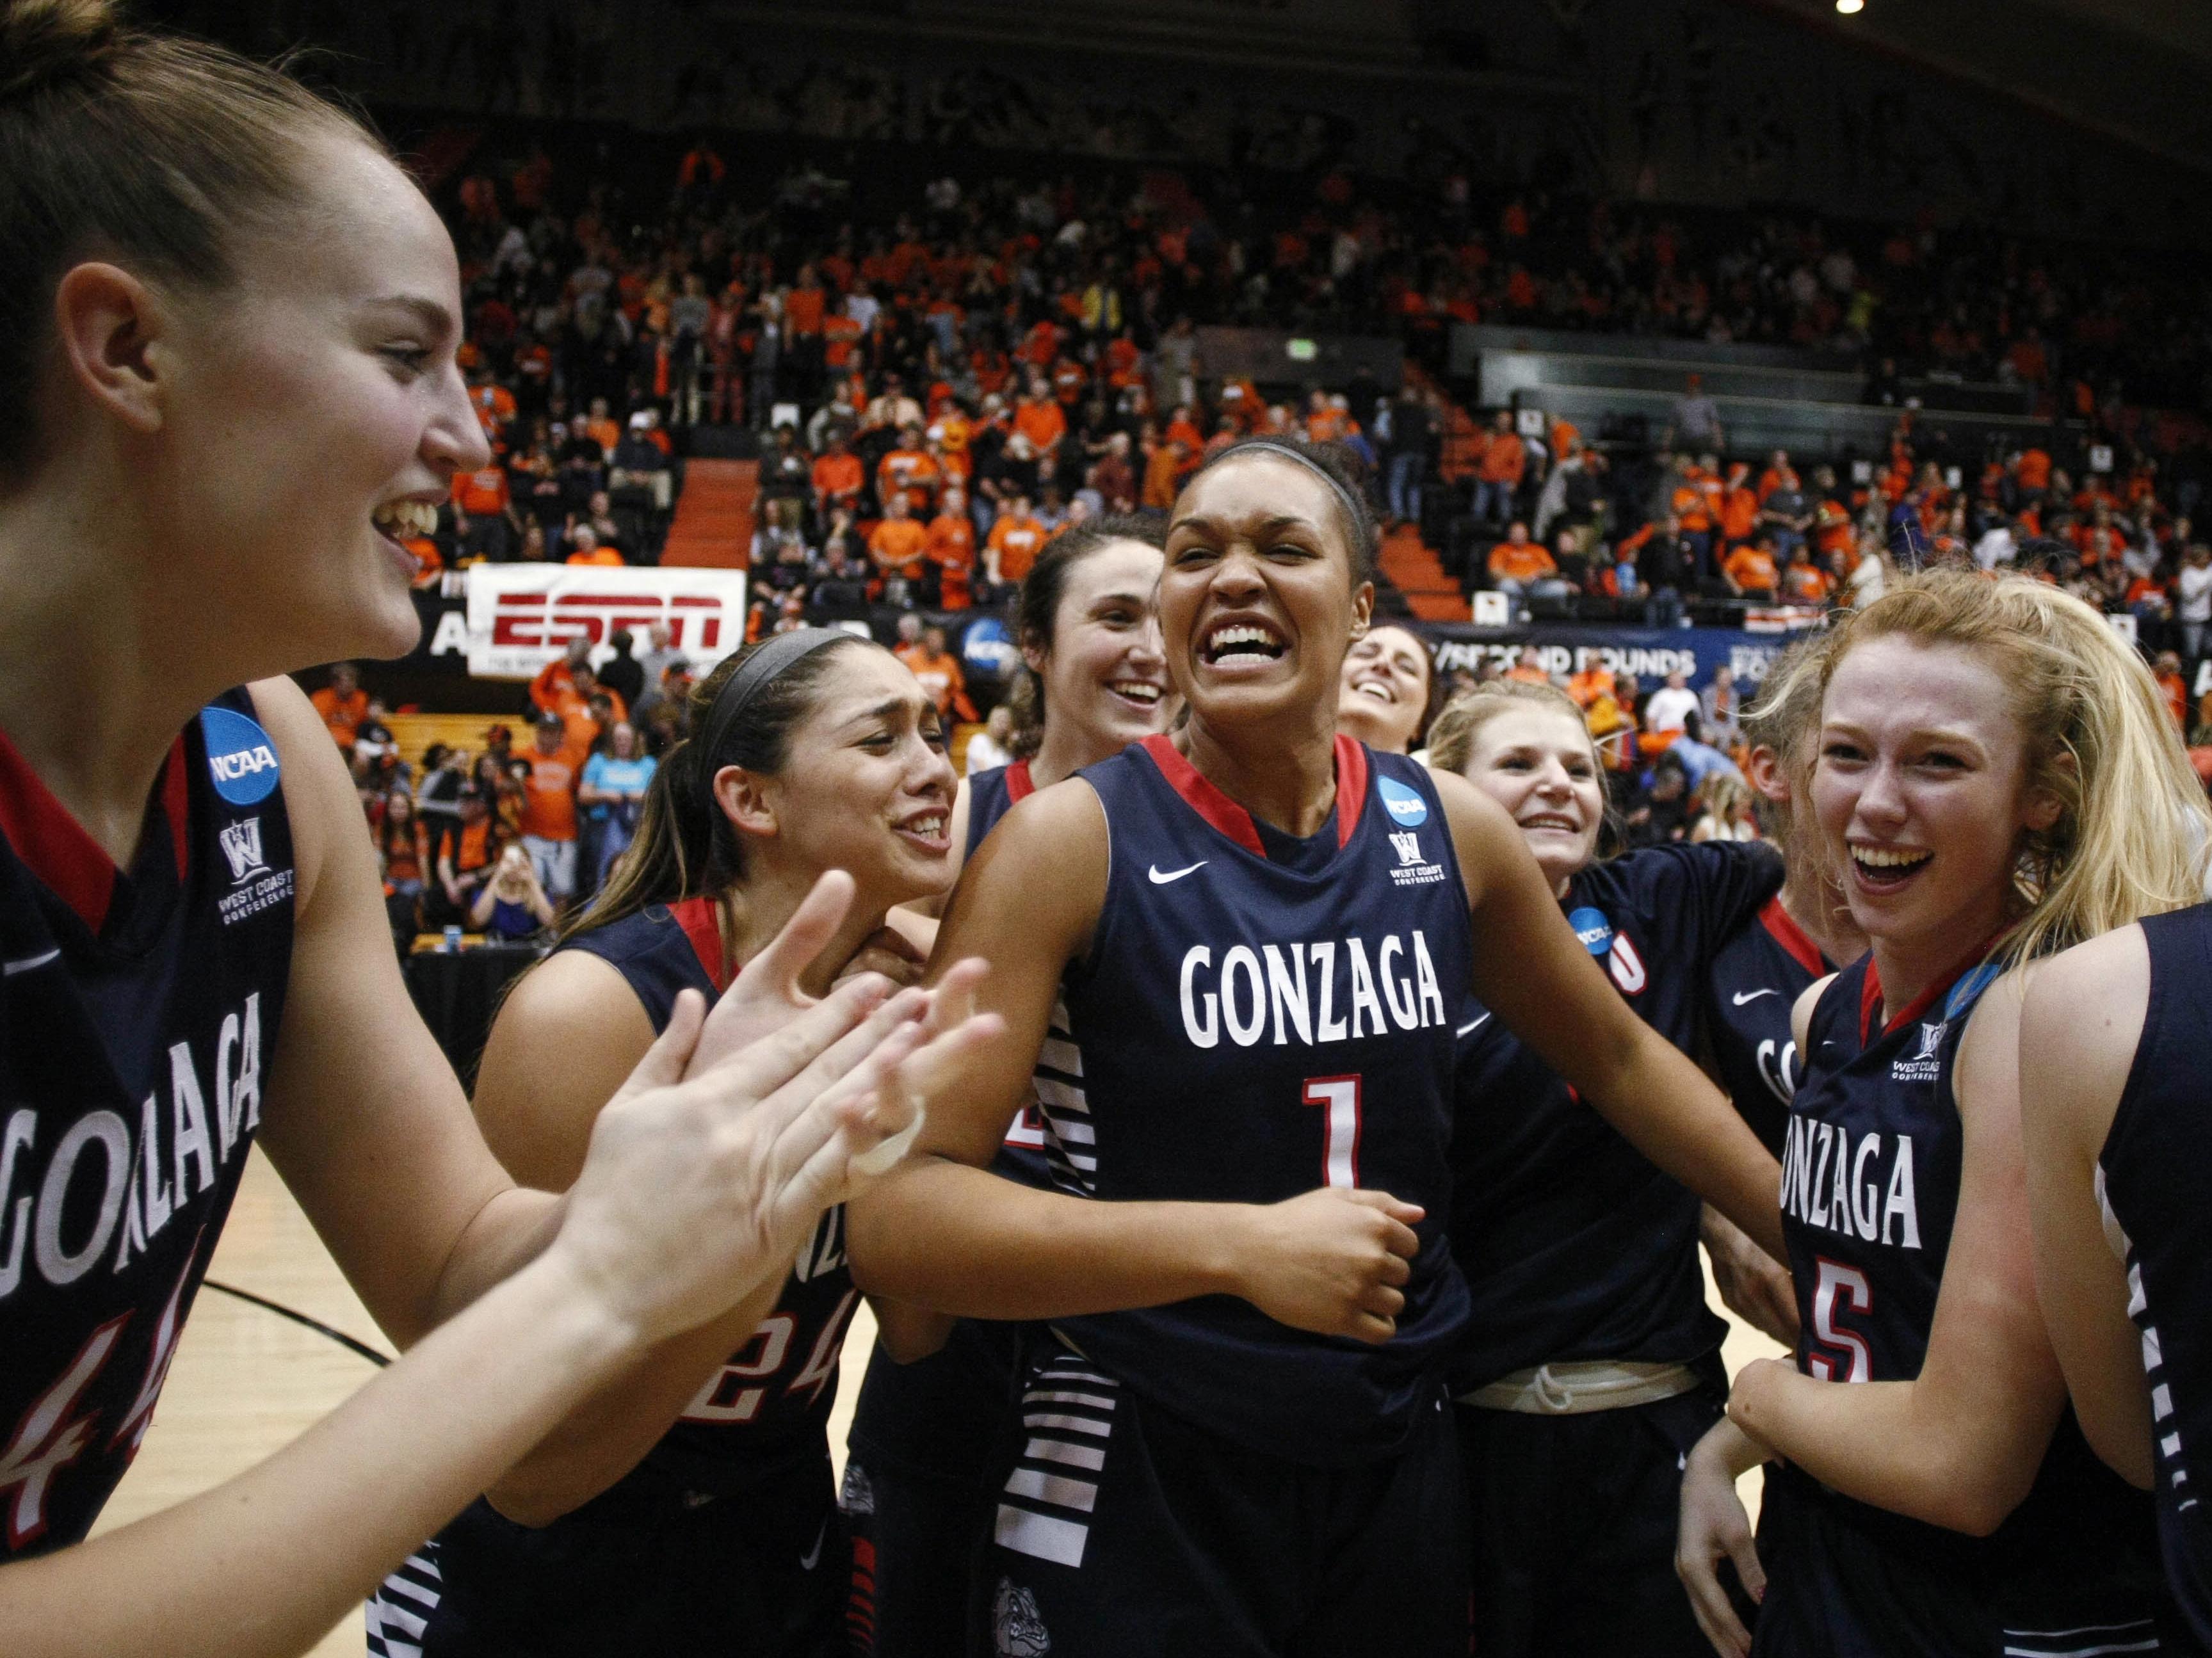 Gonzaga Oregon St Basketball